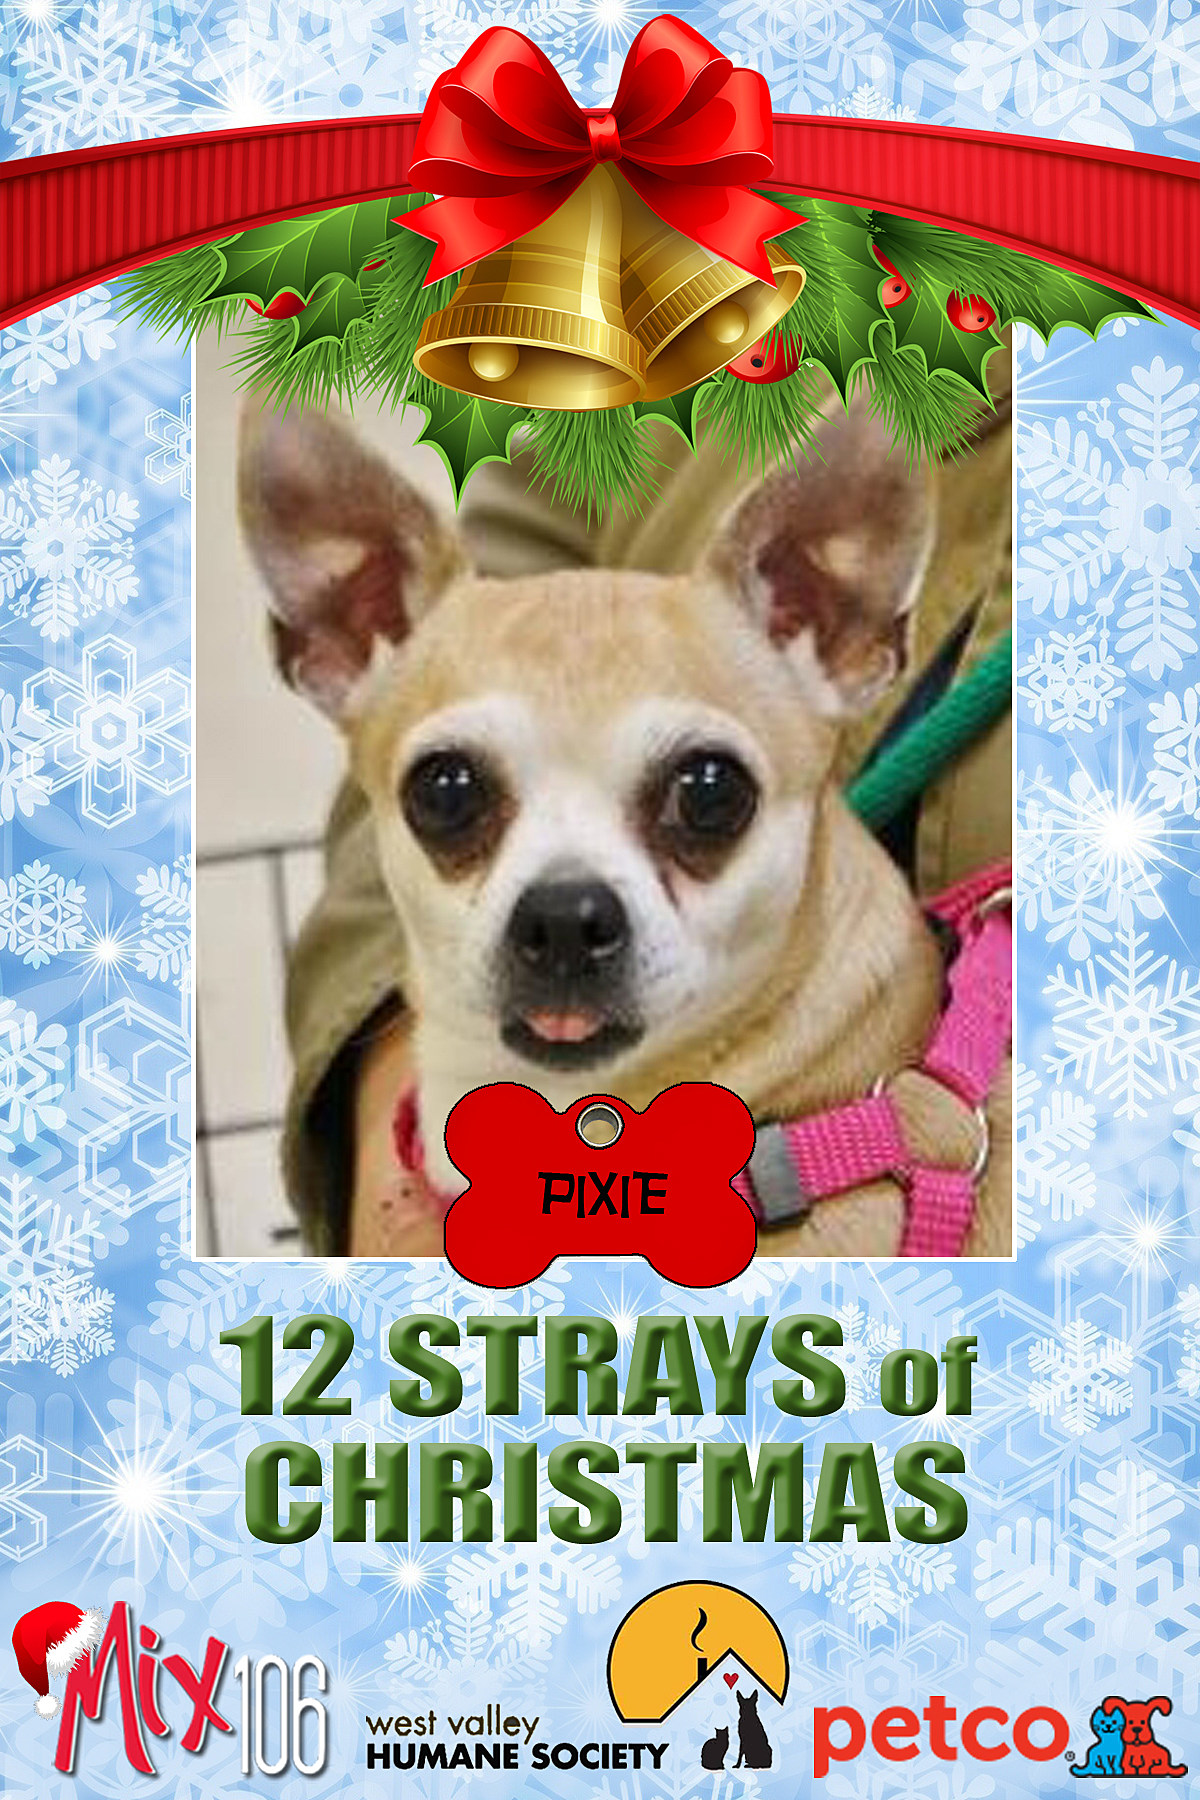 12 strays of christmas PIXIE